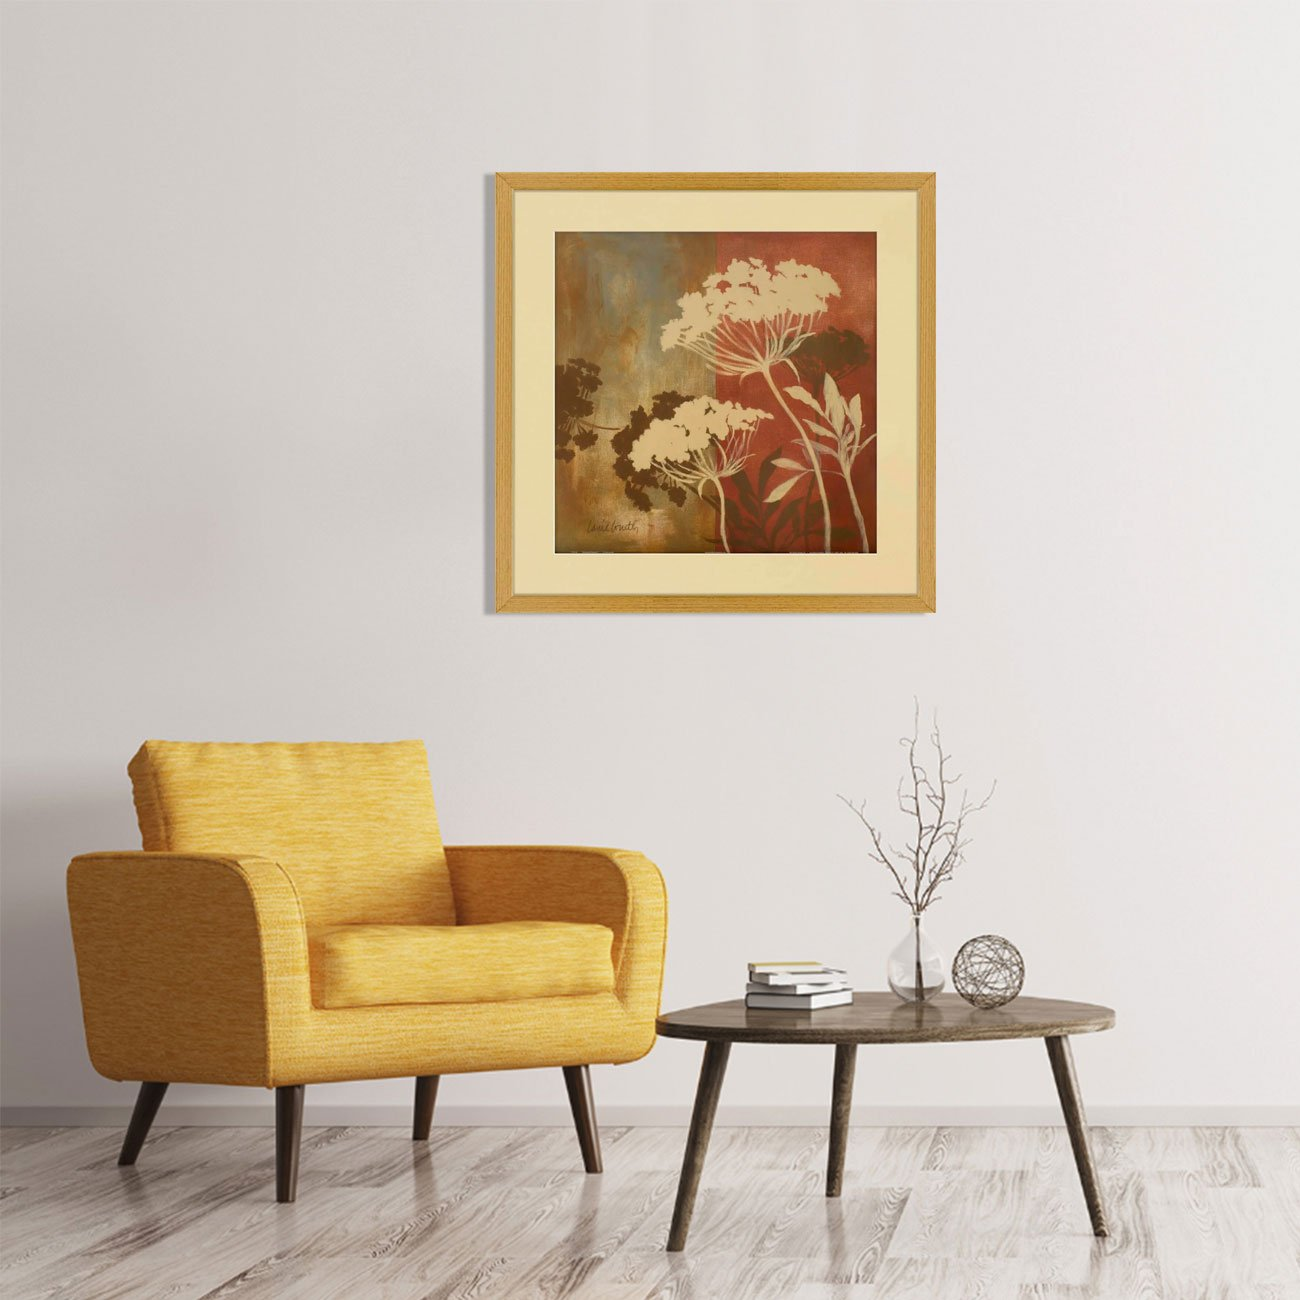 Quadro Decorativo Floral Arte de Lanie Loreth 60x60cm - DP0976